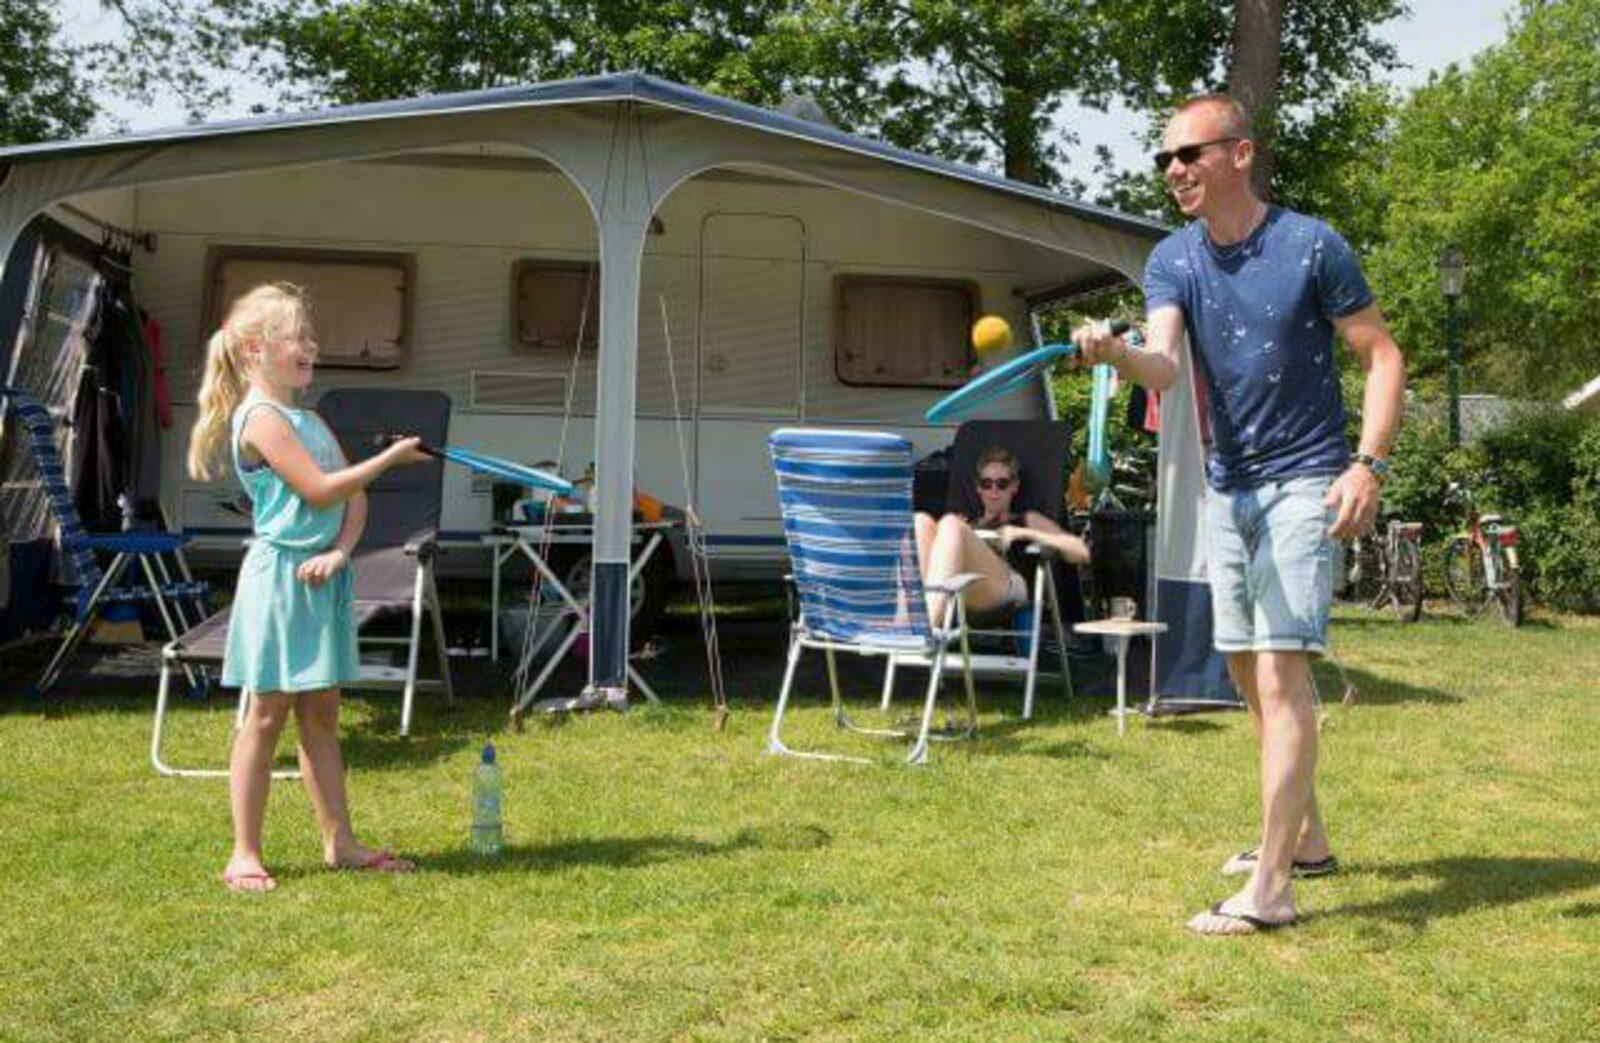 Comfort plus kampeerplaats hondenvrij - Camping 't Veld